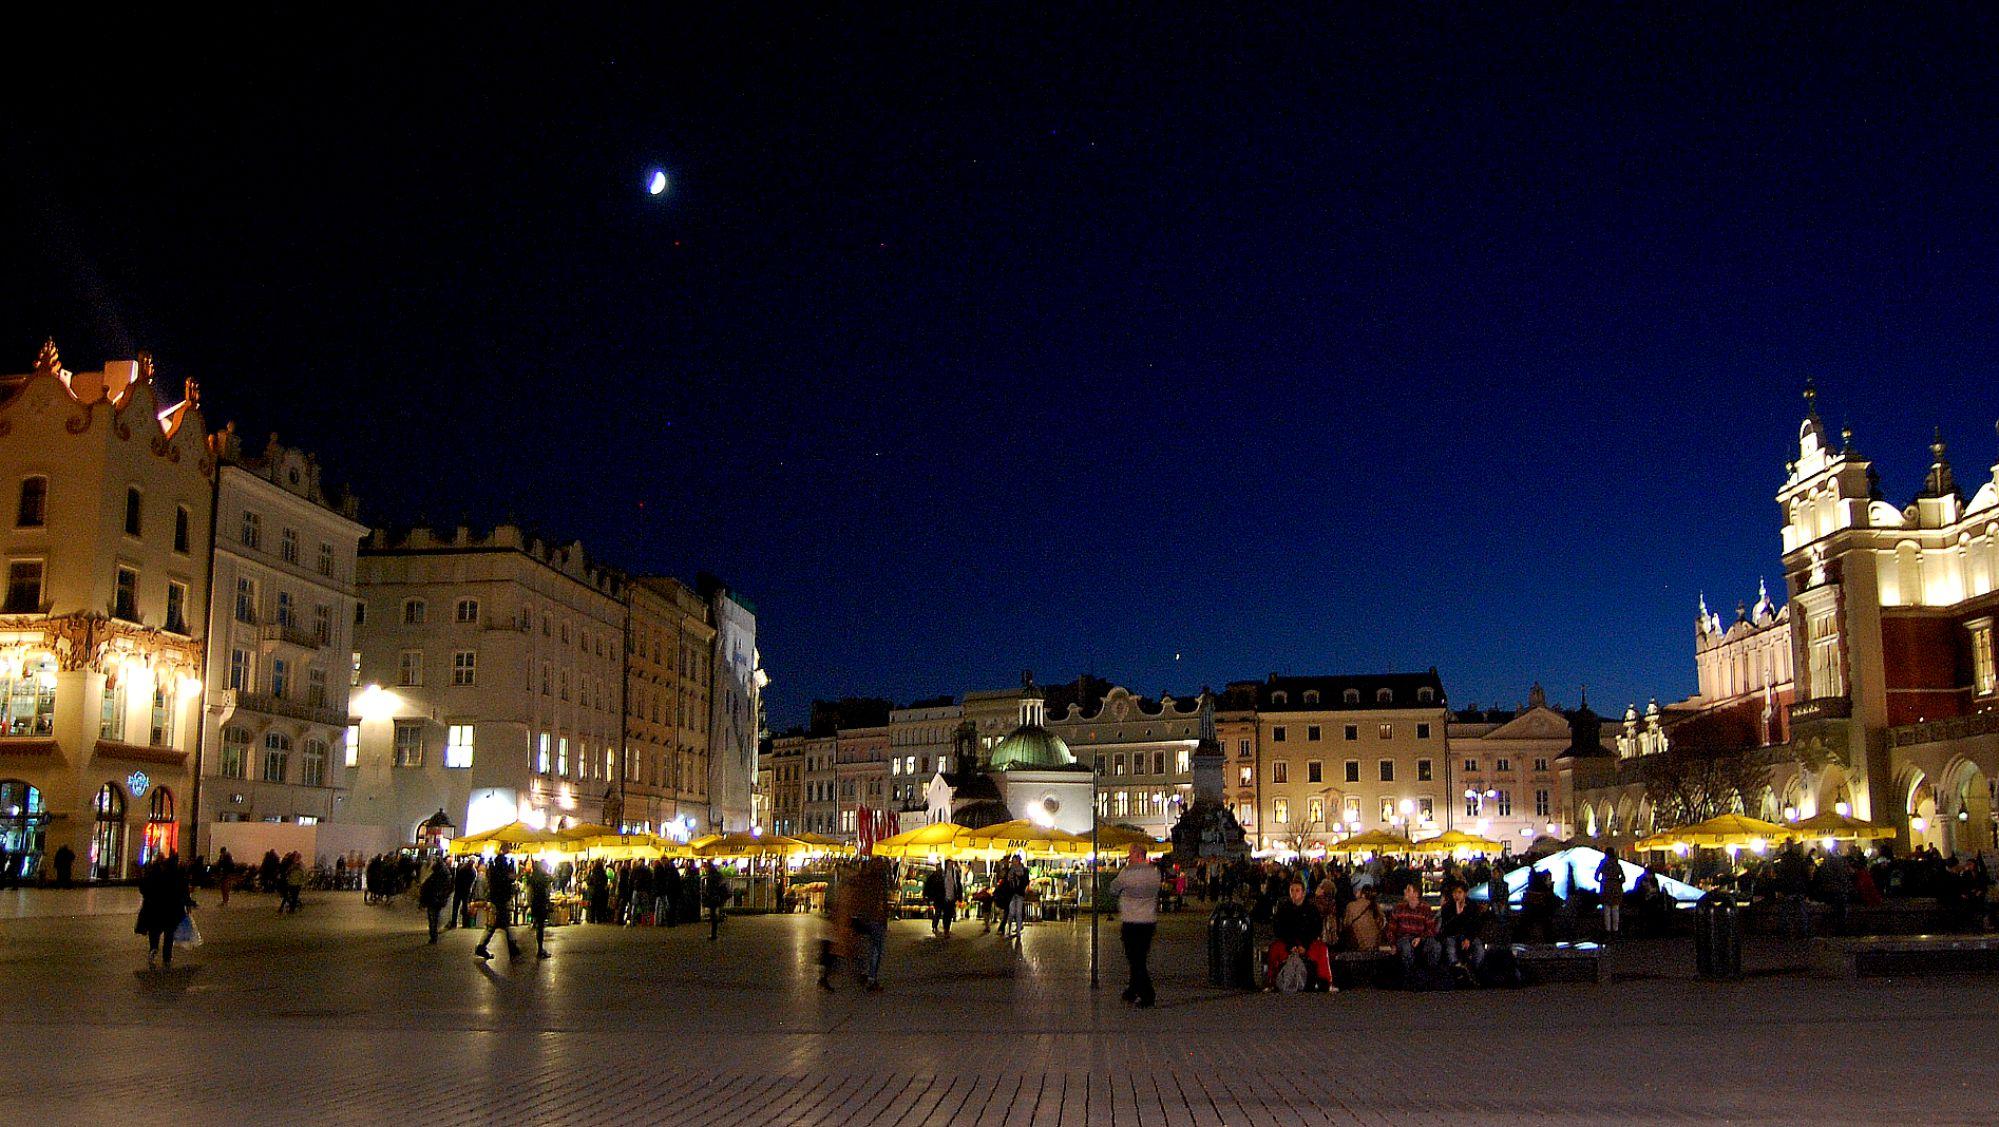 Krackow Main Square Evening Market